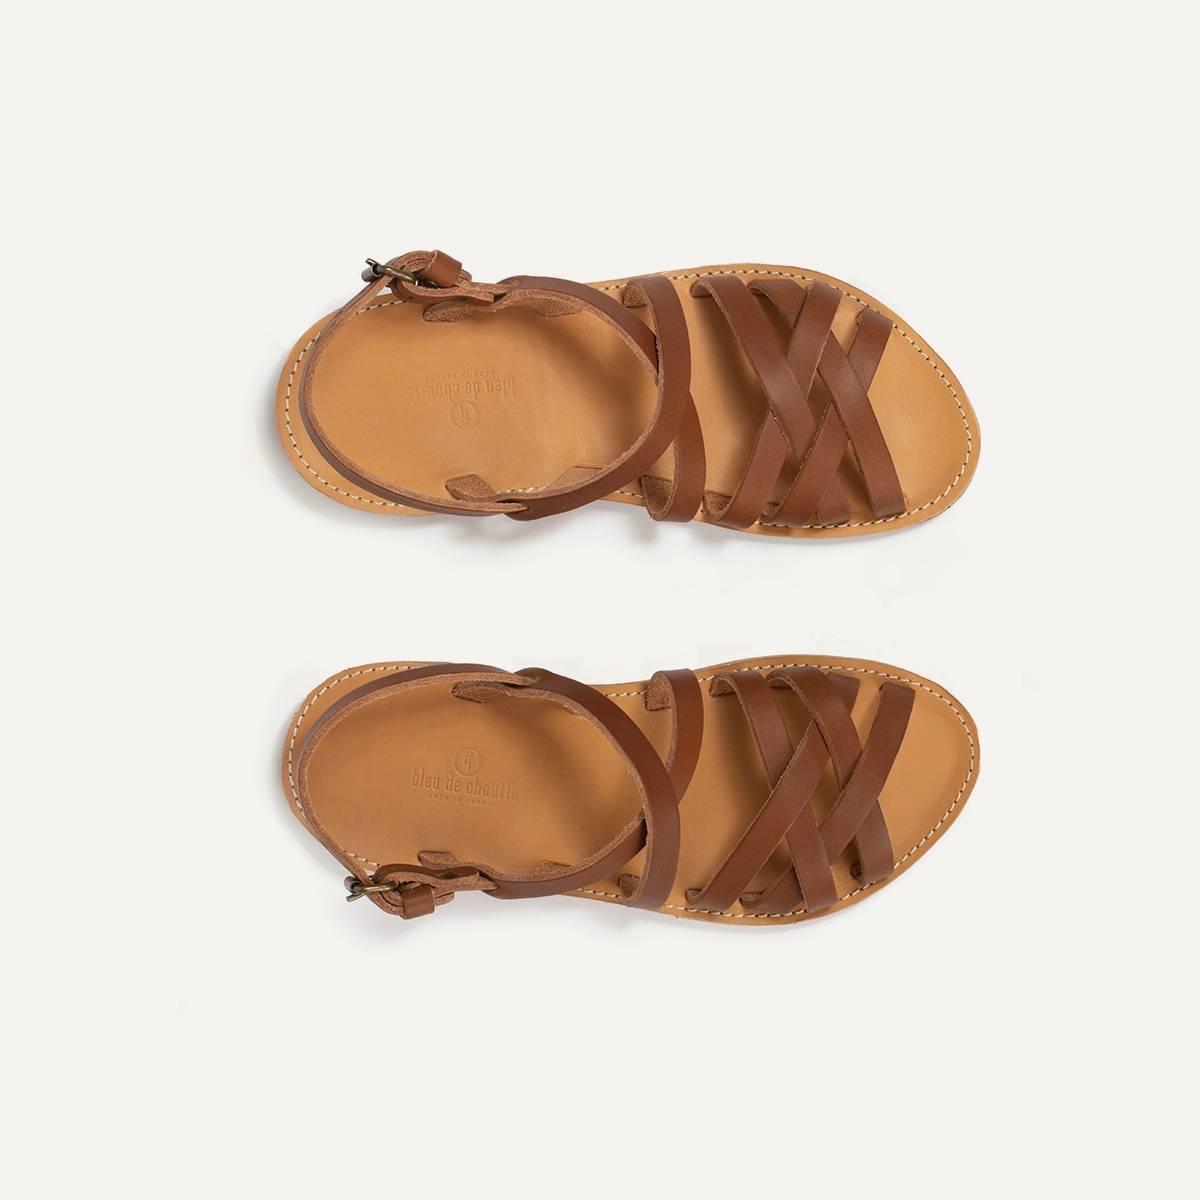 Sandales cuir Majour - Pain Brûlé (image n°1)